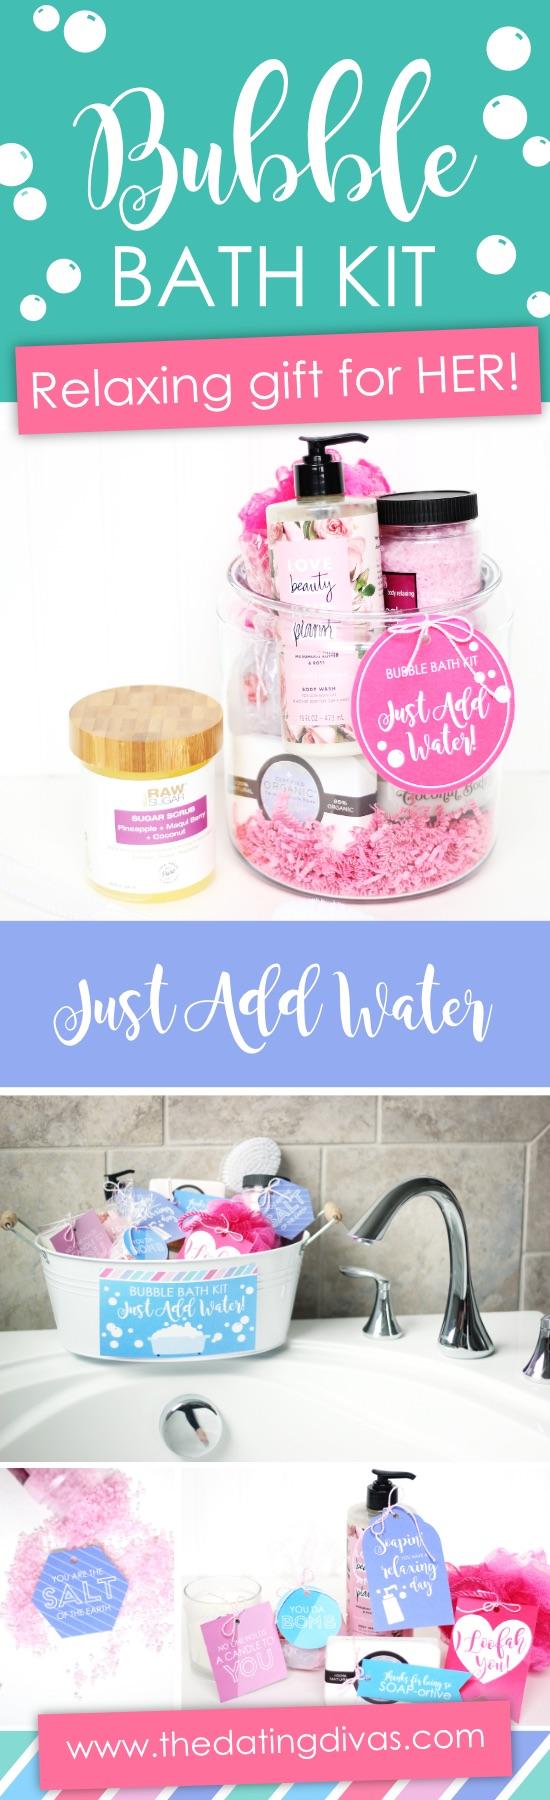 Bubble Bath Relaxing Gift For Mom #relaxinggiftformom #mothersdaygift #bubblebathkit #giftbasketformom #stressreliefgiftformom